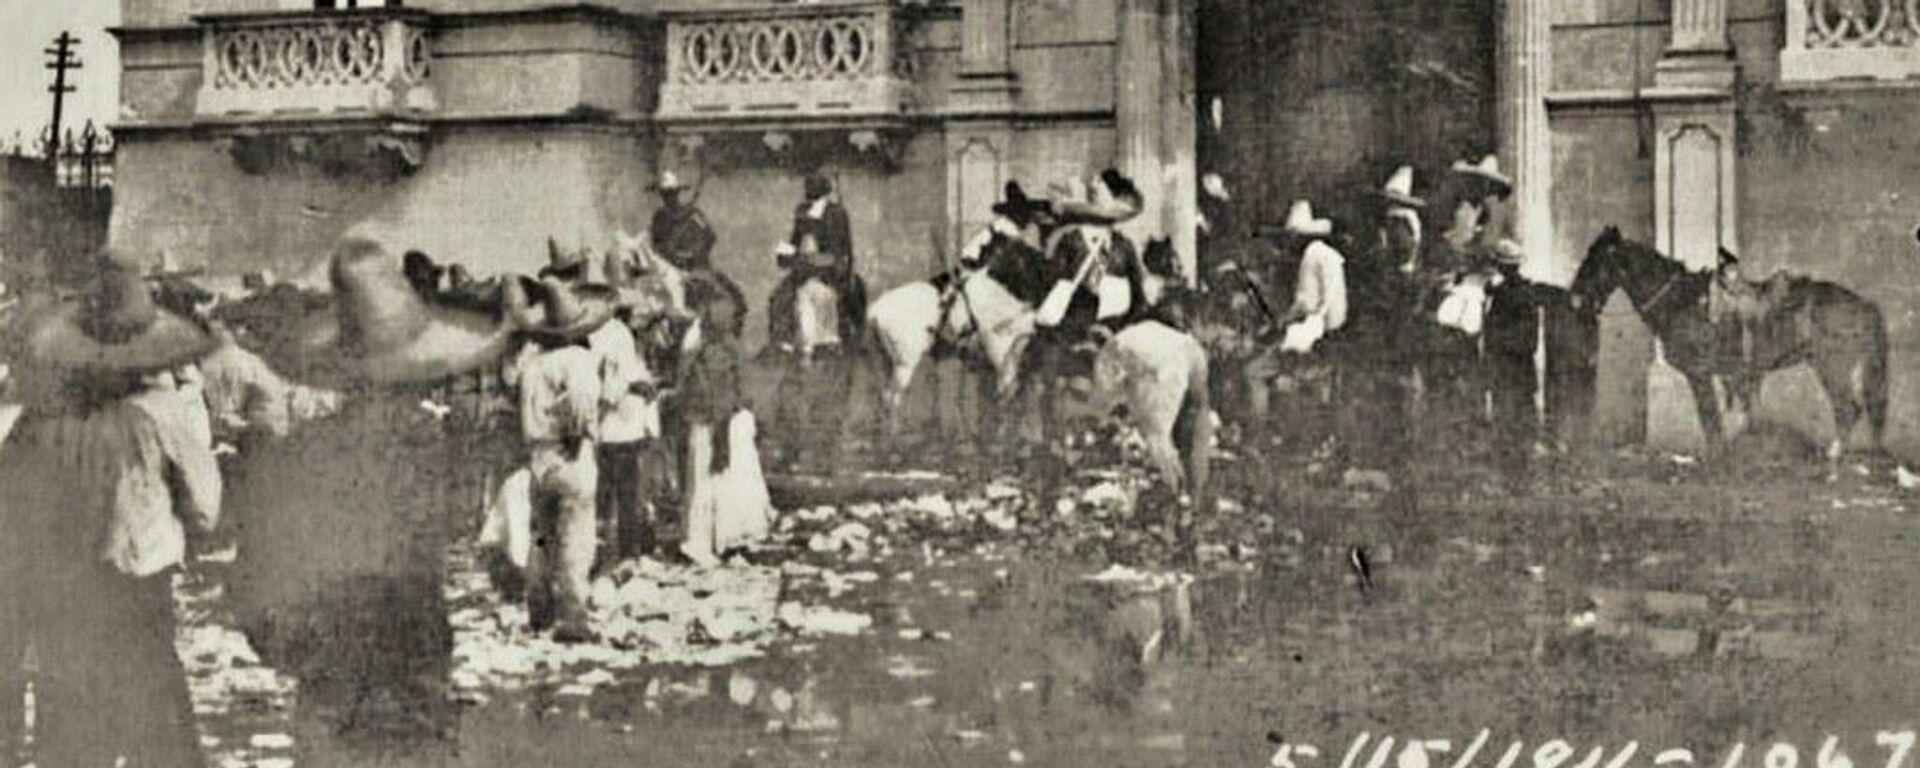 Maderistas entrando al casino de La Laguna el 15 de mayo de 1911 - Sputnik Mundo, 1920, 19.02.2021